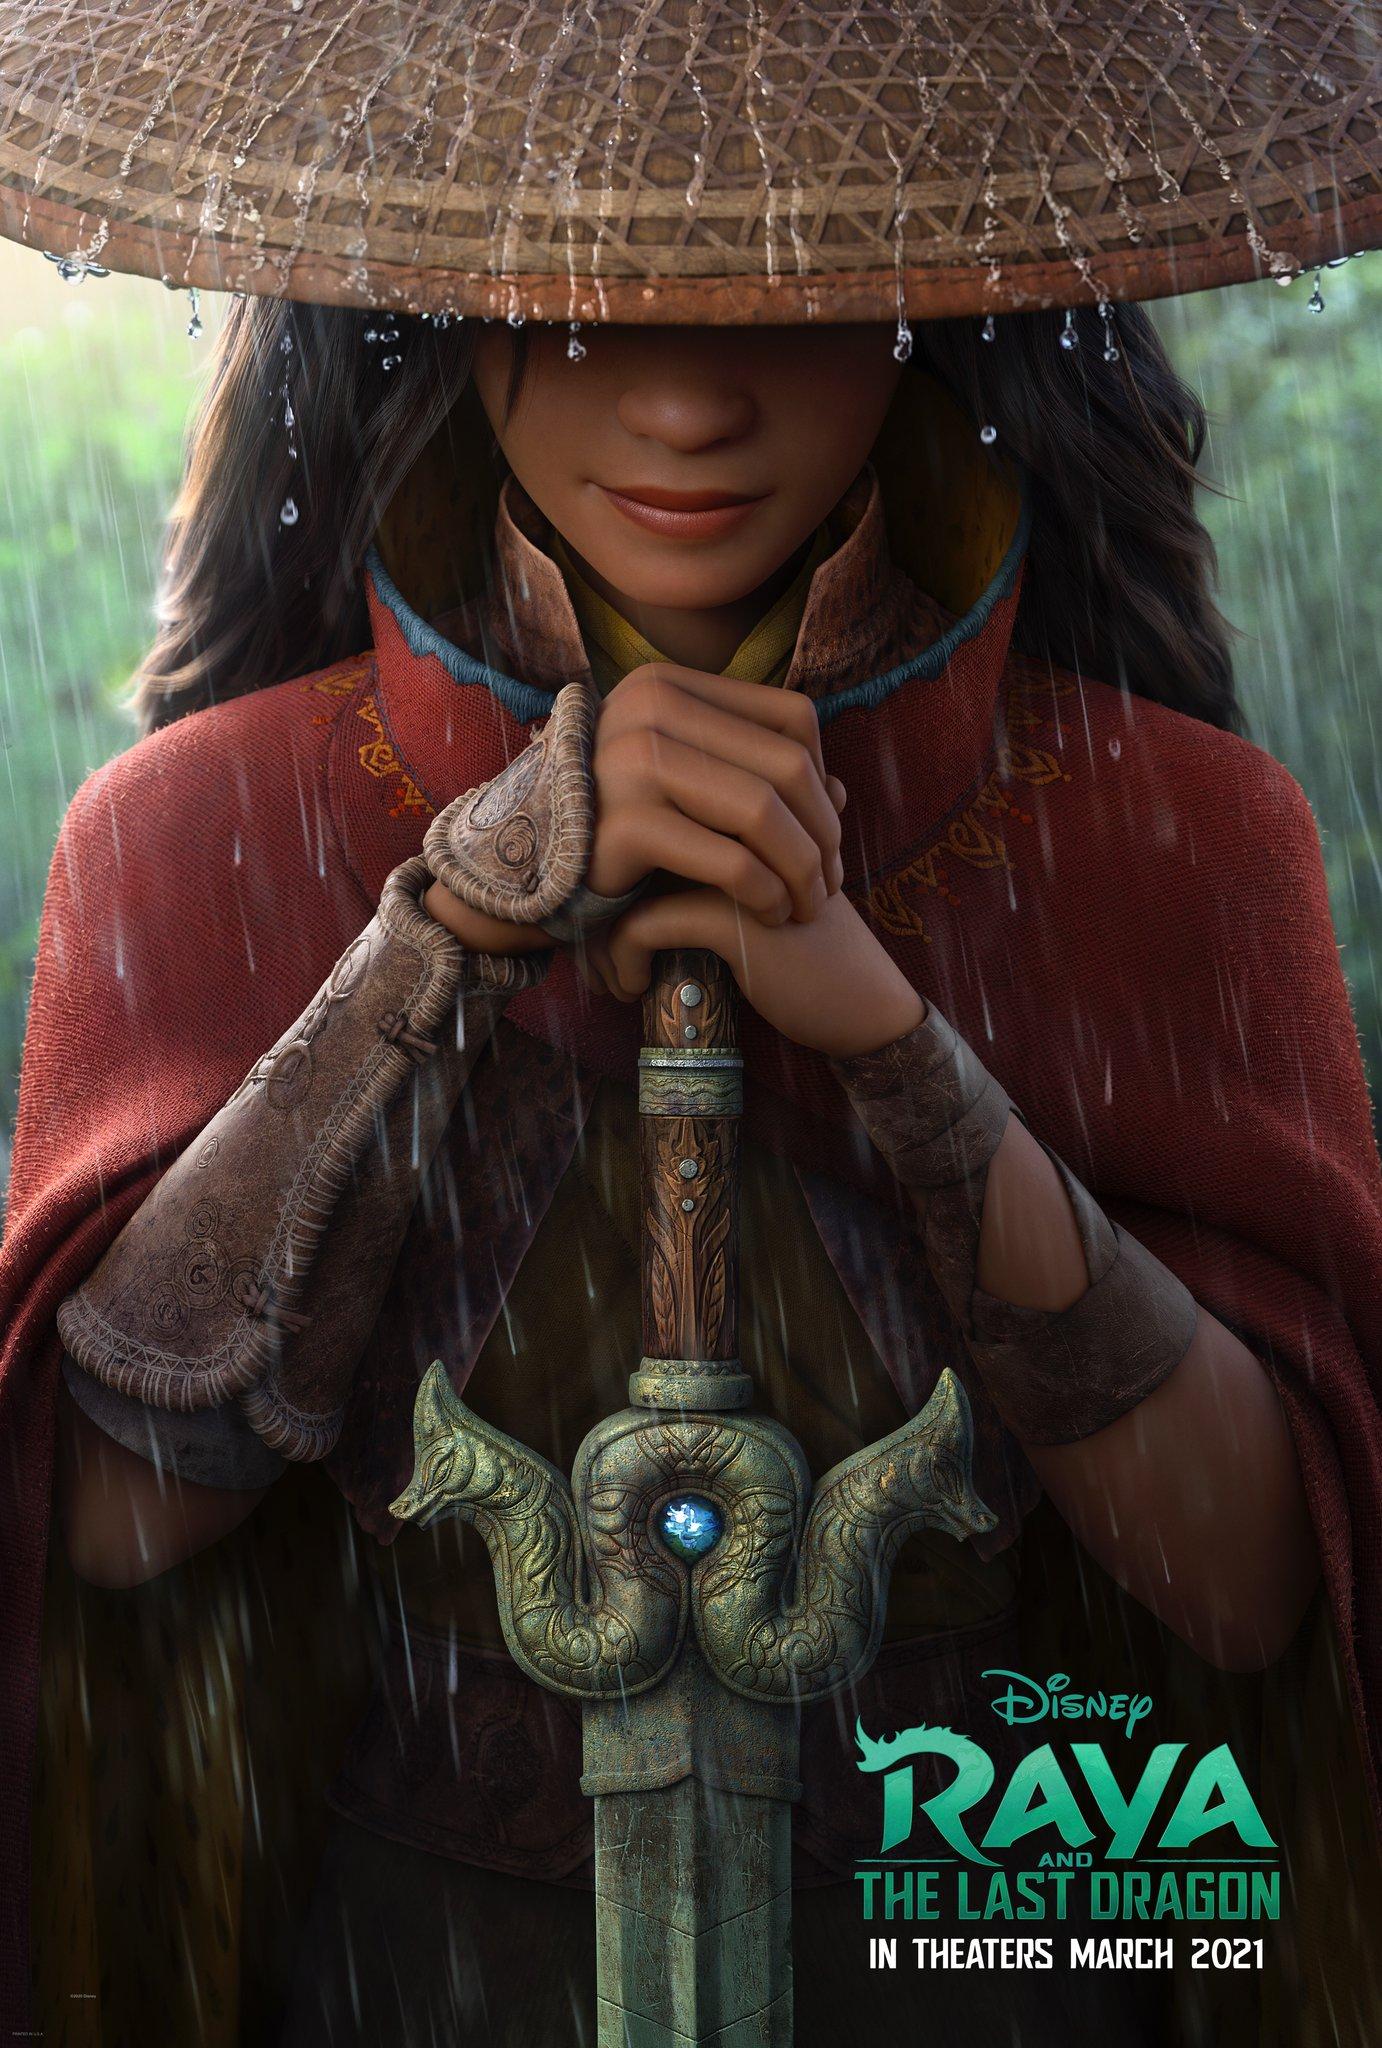 Raya et le Dernier Dragon [Walt Disney - 2021] - Page 5 Ekx-8m8UcAAUXhv?format=jpg&name=large